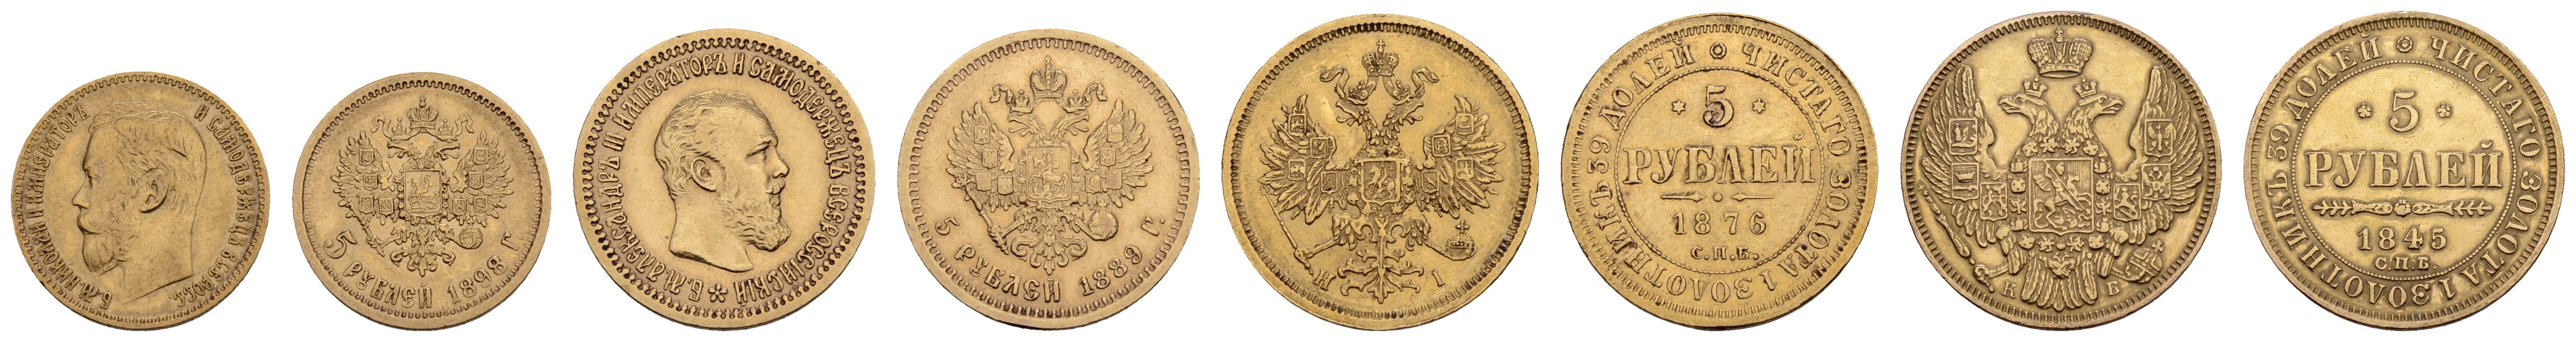 Lot 1739 - europa ab 1800 - Russland -  Auktionshaus Ulrich Felzmann GmbH & Co. KG Coins single lots